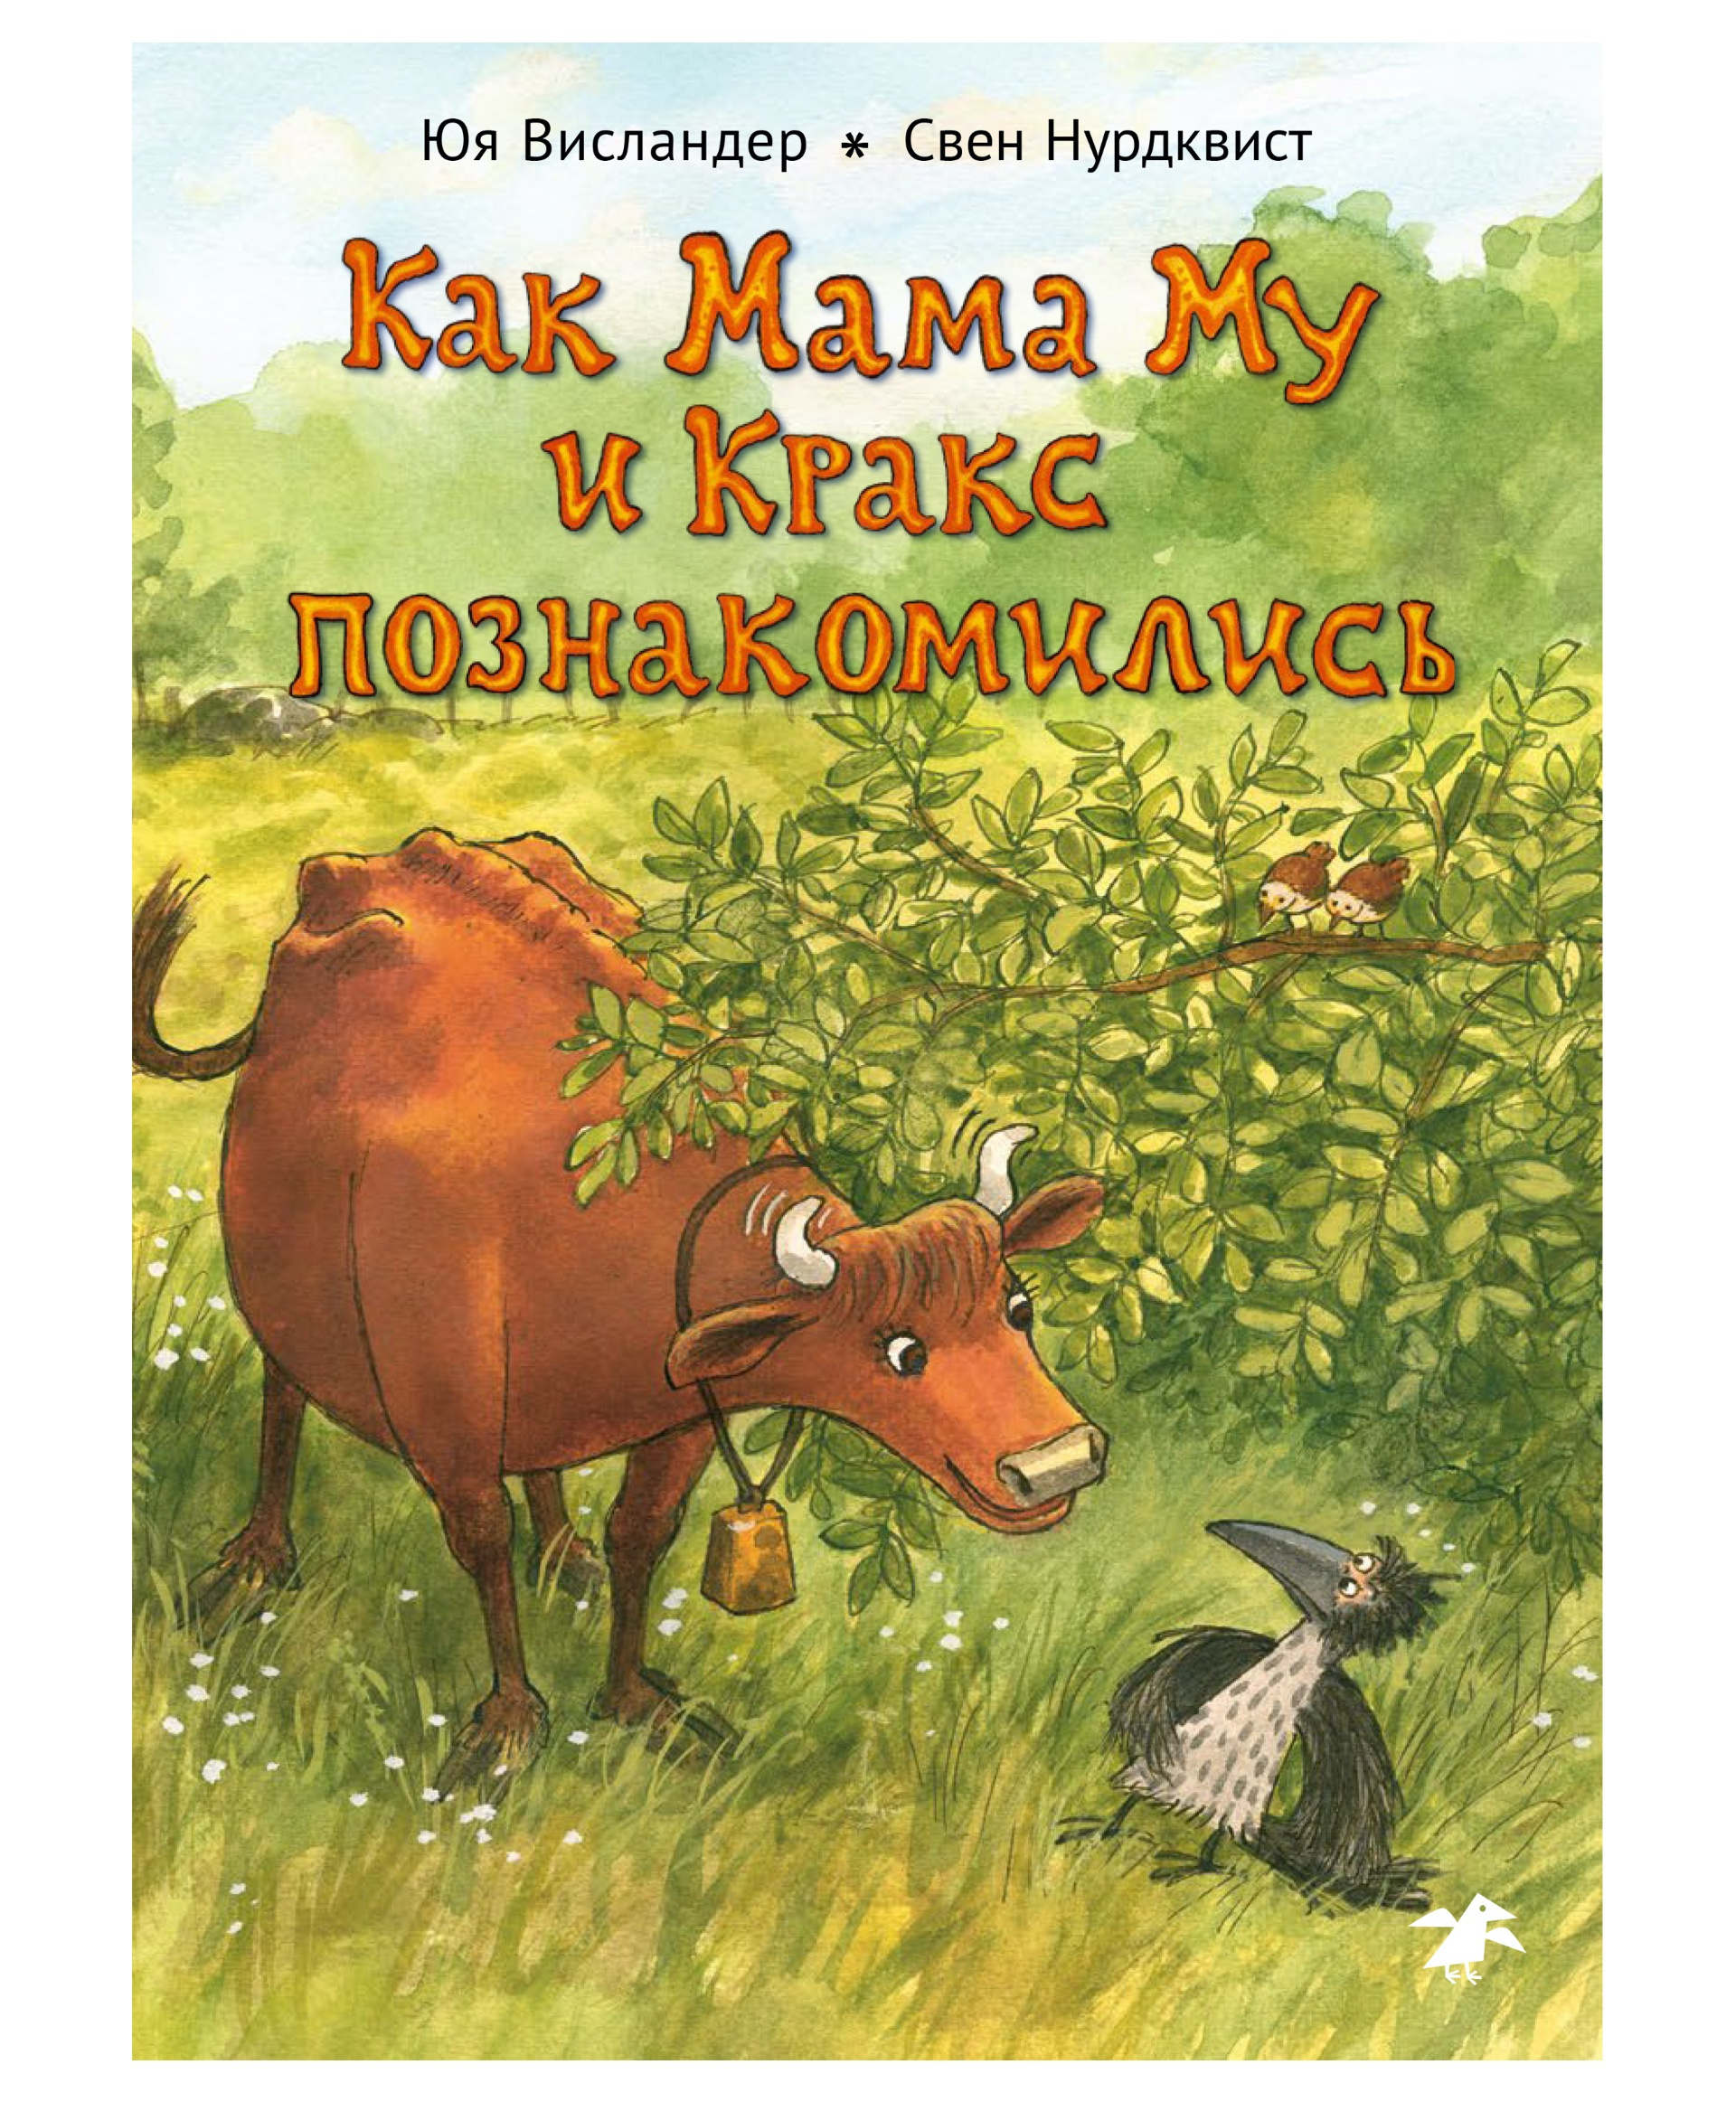 Белая Ворона книга 'Как Мама Му и Кракс познакомились'